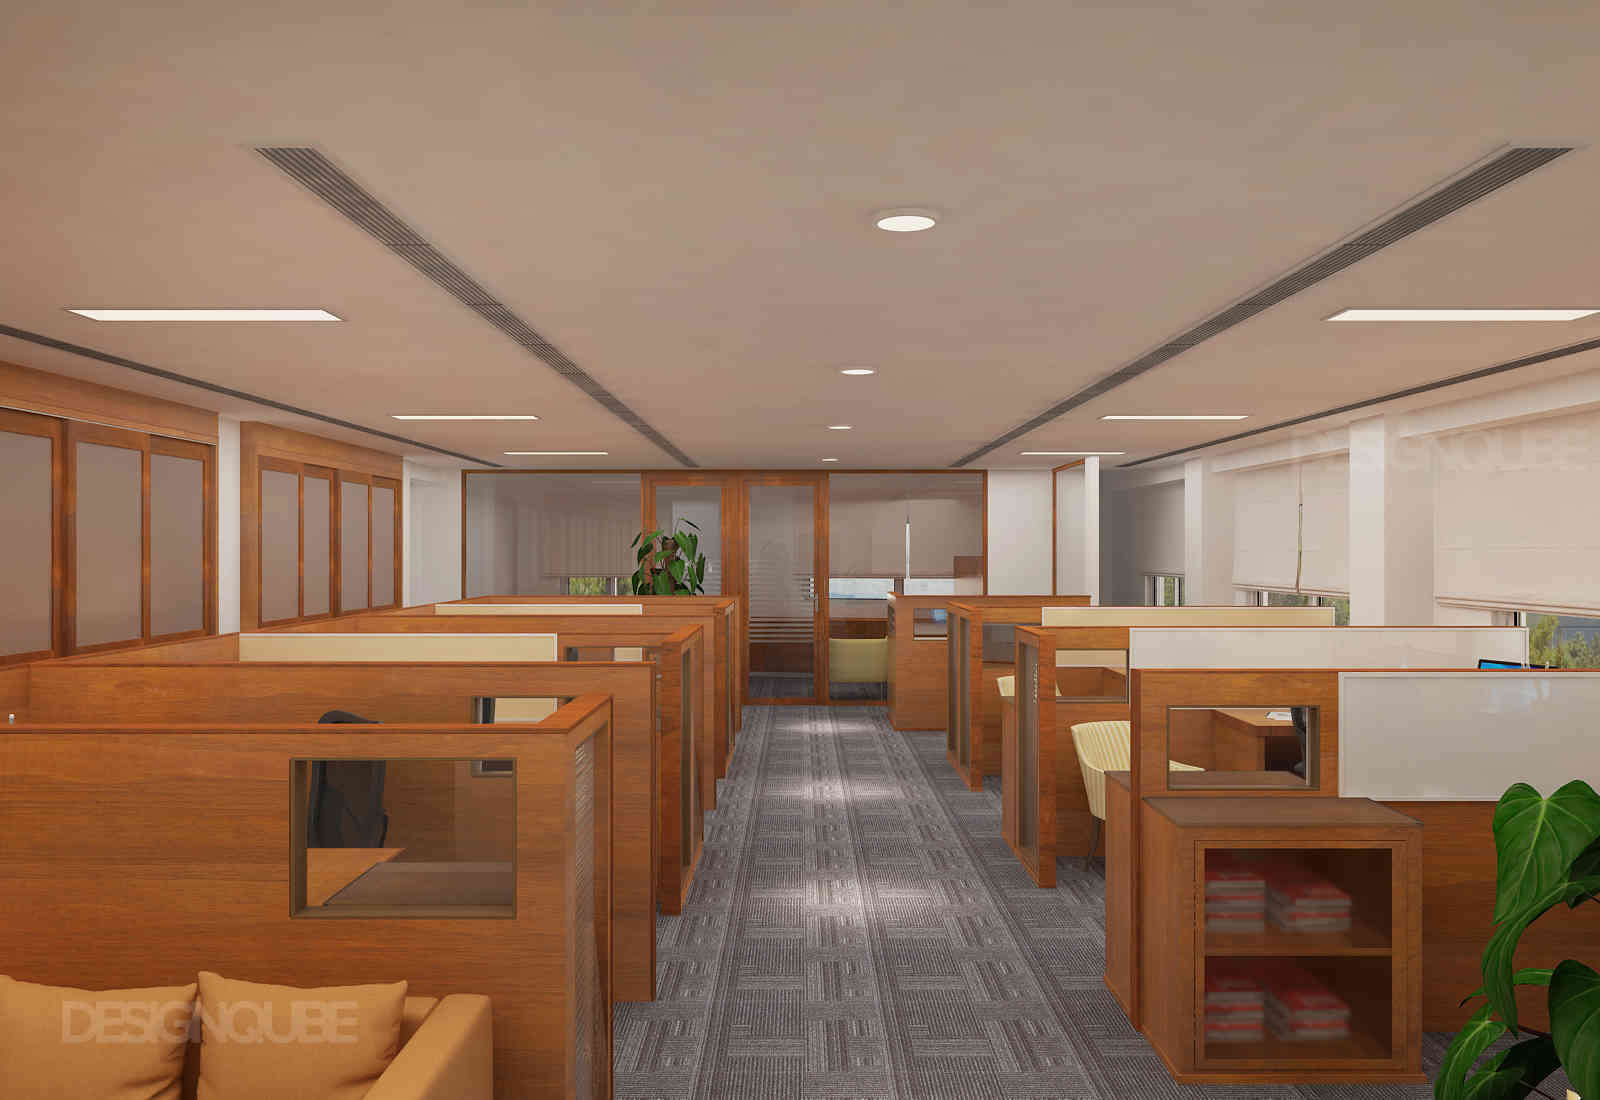 Architects Interior Designers For Commercial Interiors Designqube